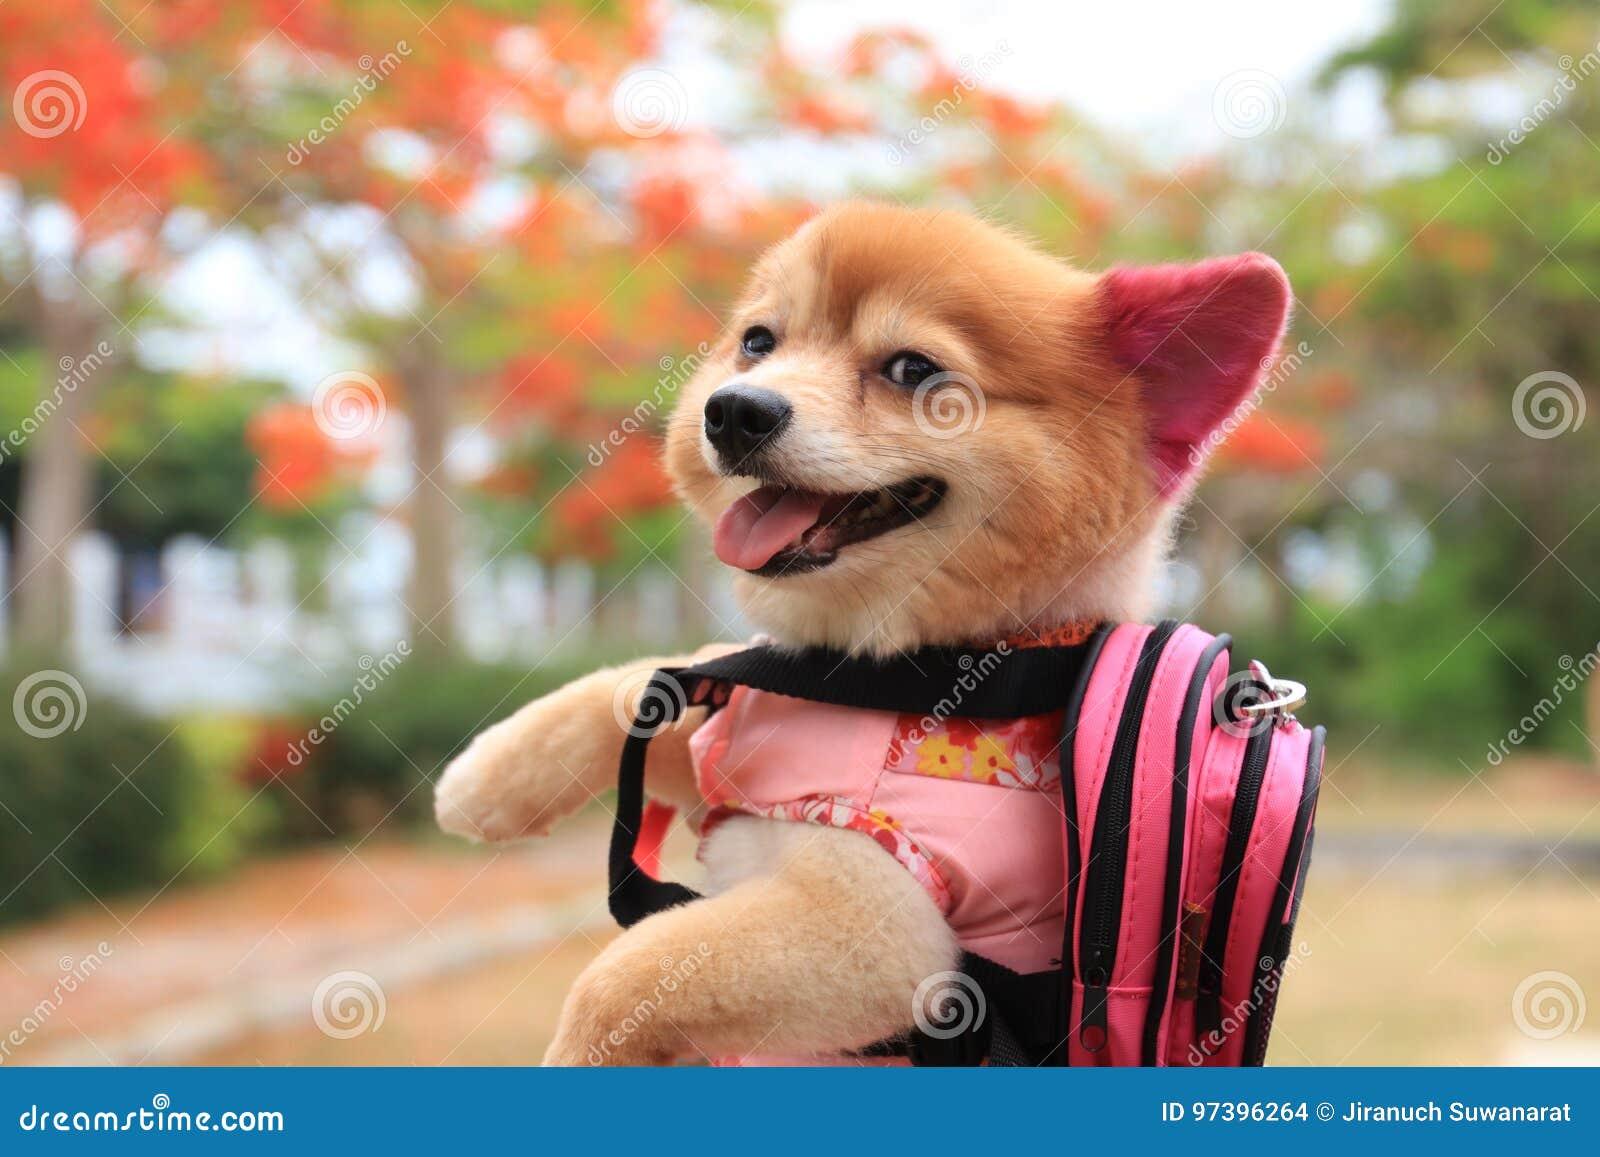 Cute Dog Wearing A Shirt Stock Photo Image Of Portrait 97396264